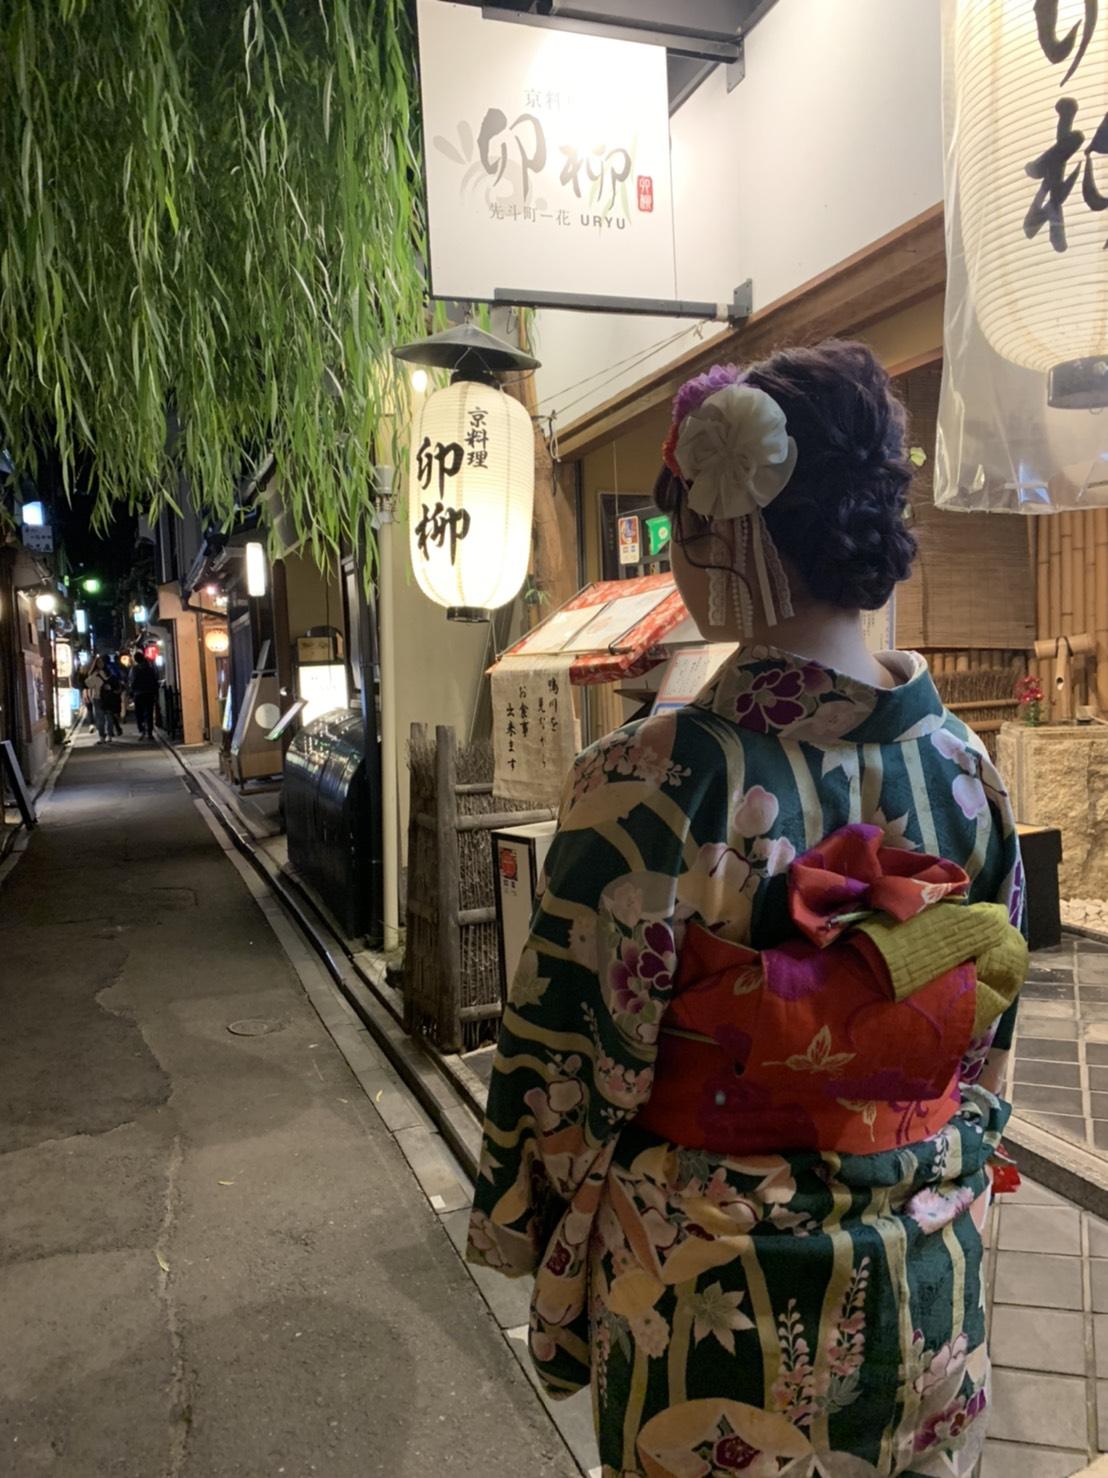 FLOWERS BY NAKED 2019 京都・二条城 大人気2019年11月17日12